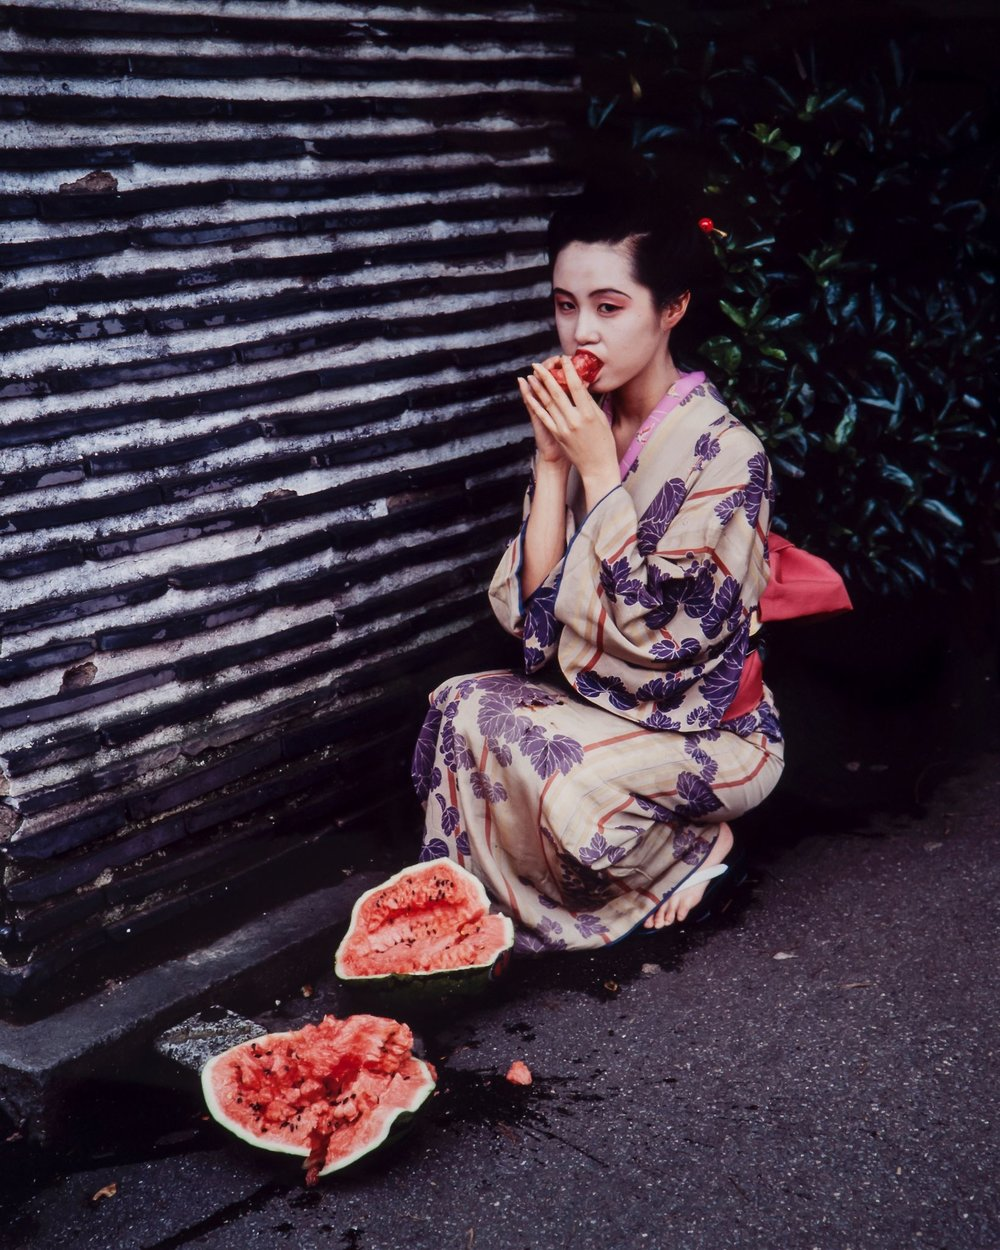 ©Nobuyoshi Araki , Colourscapes, 1991  Courtesy of Museum of Sex Collection.